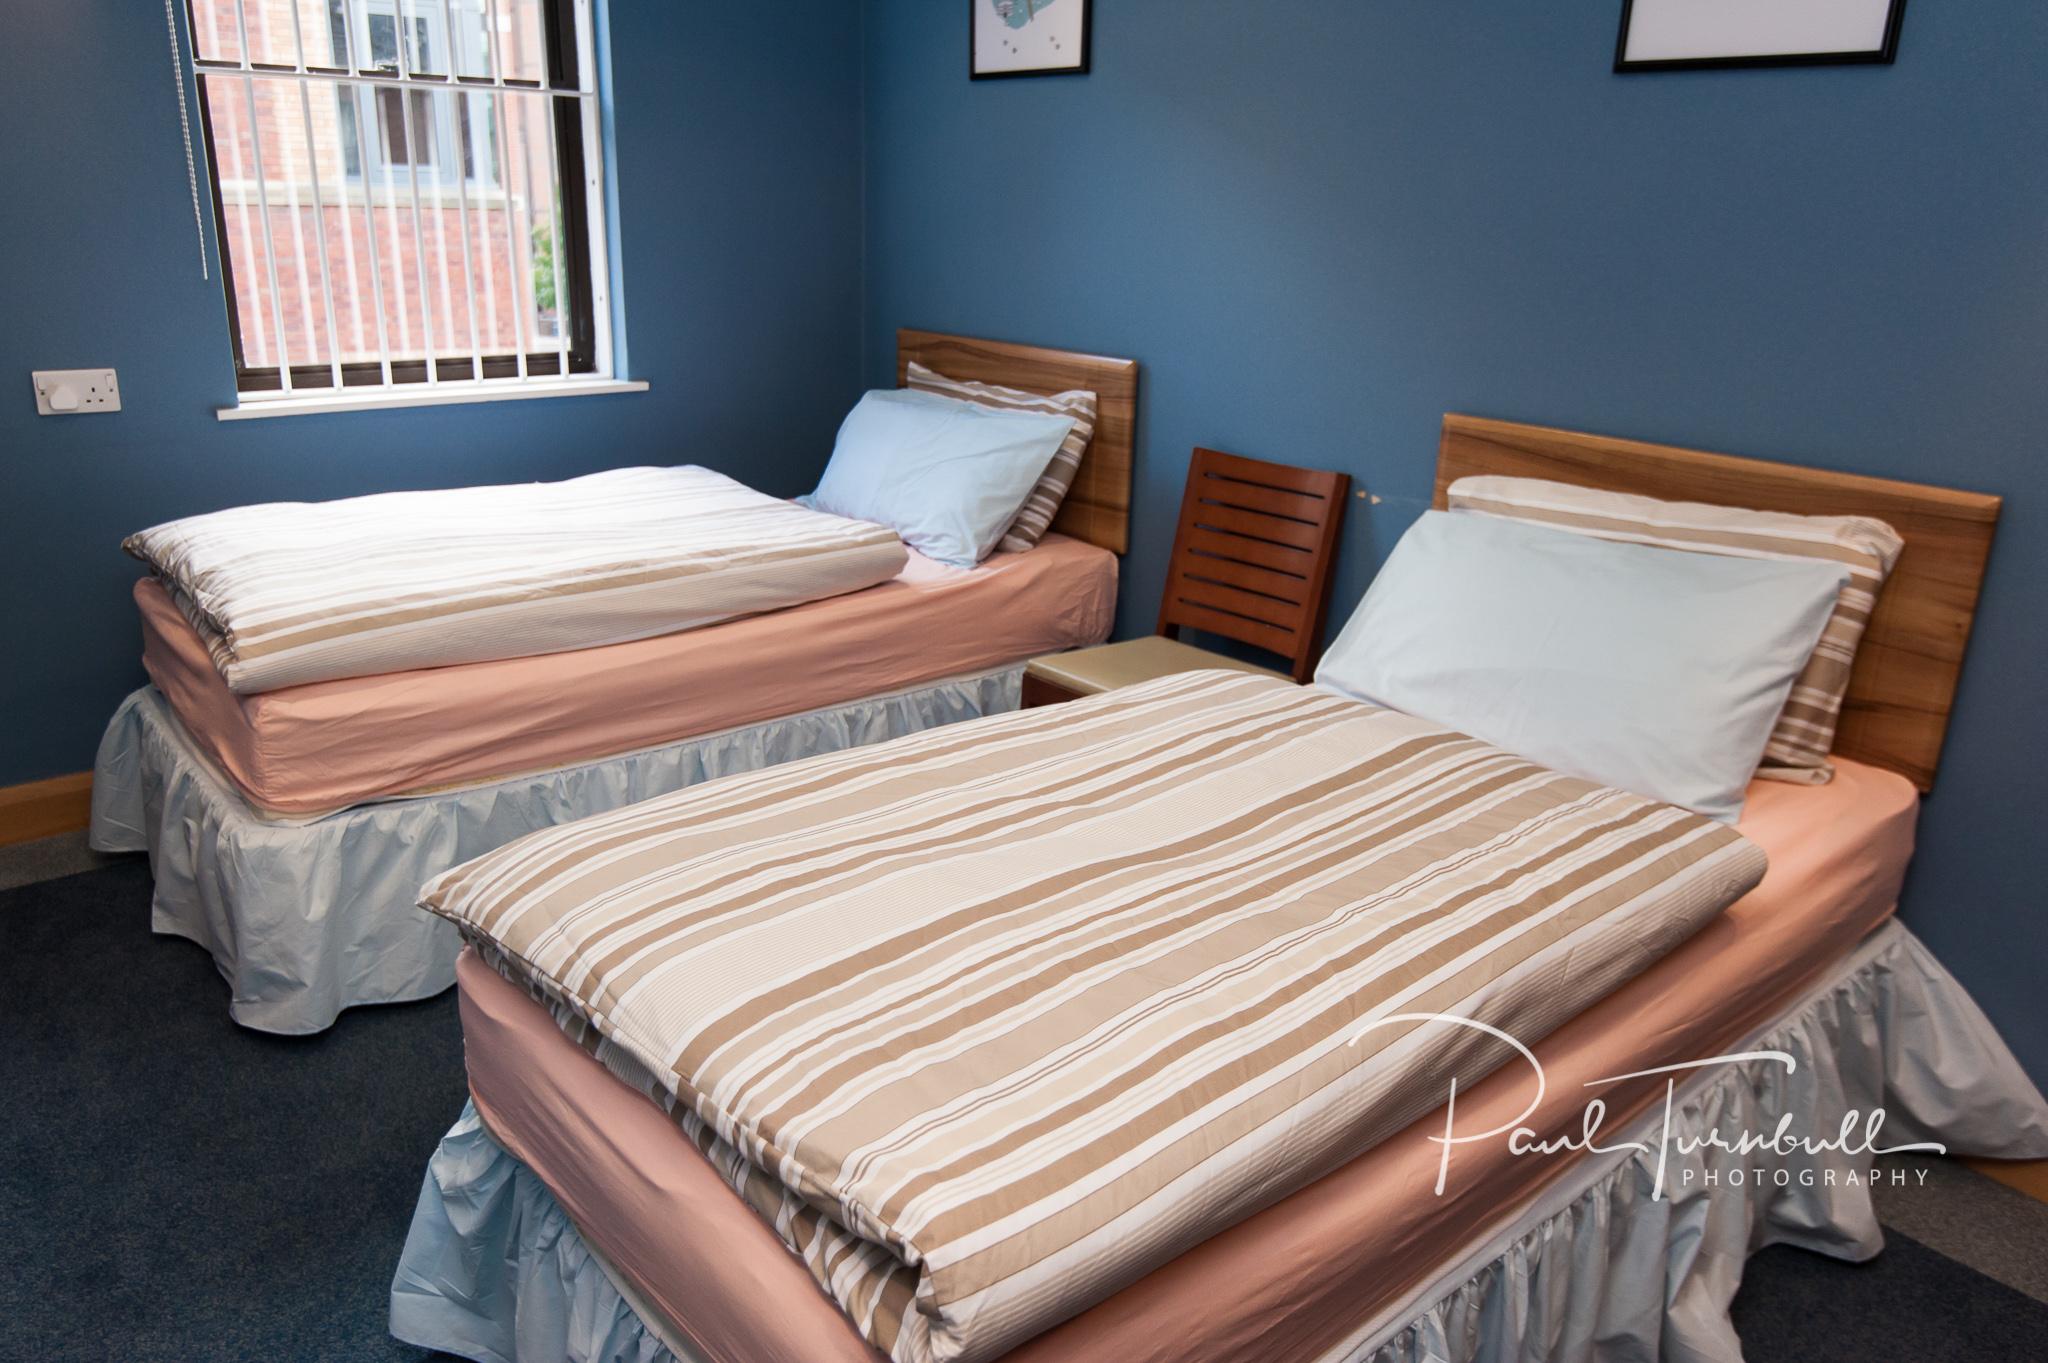 commercial-property-photographer-leeds-yorkshire-rs-hostels-012.jpg